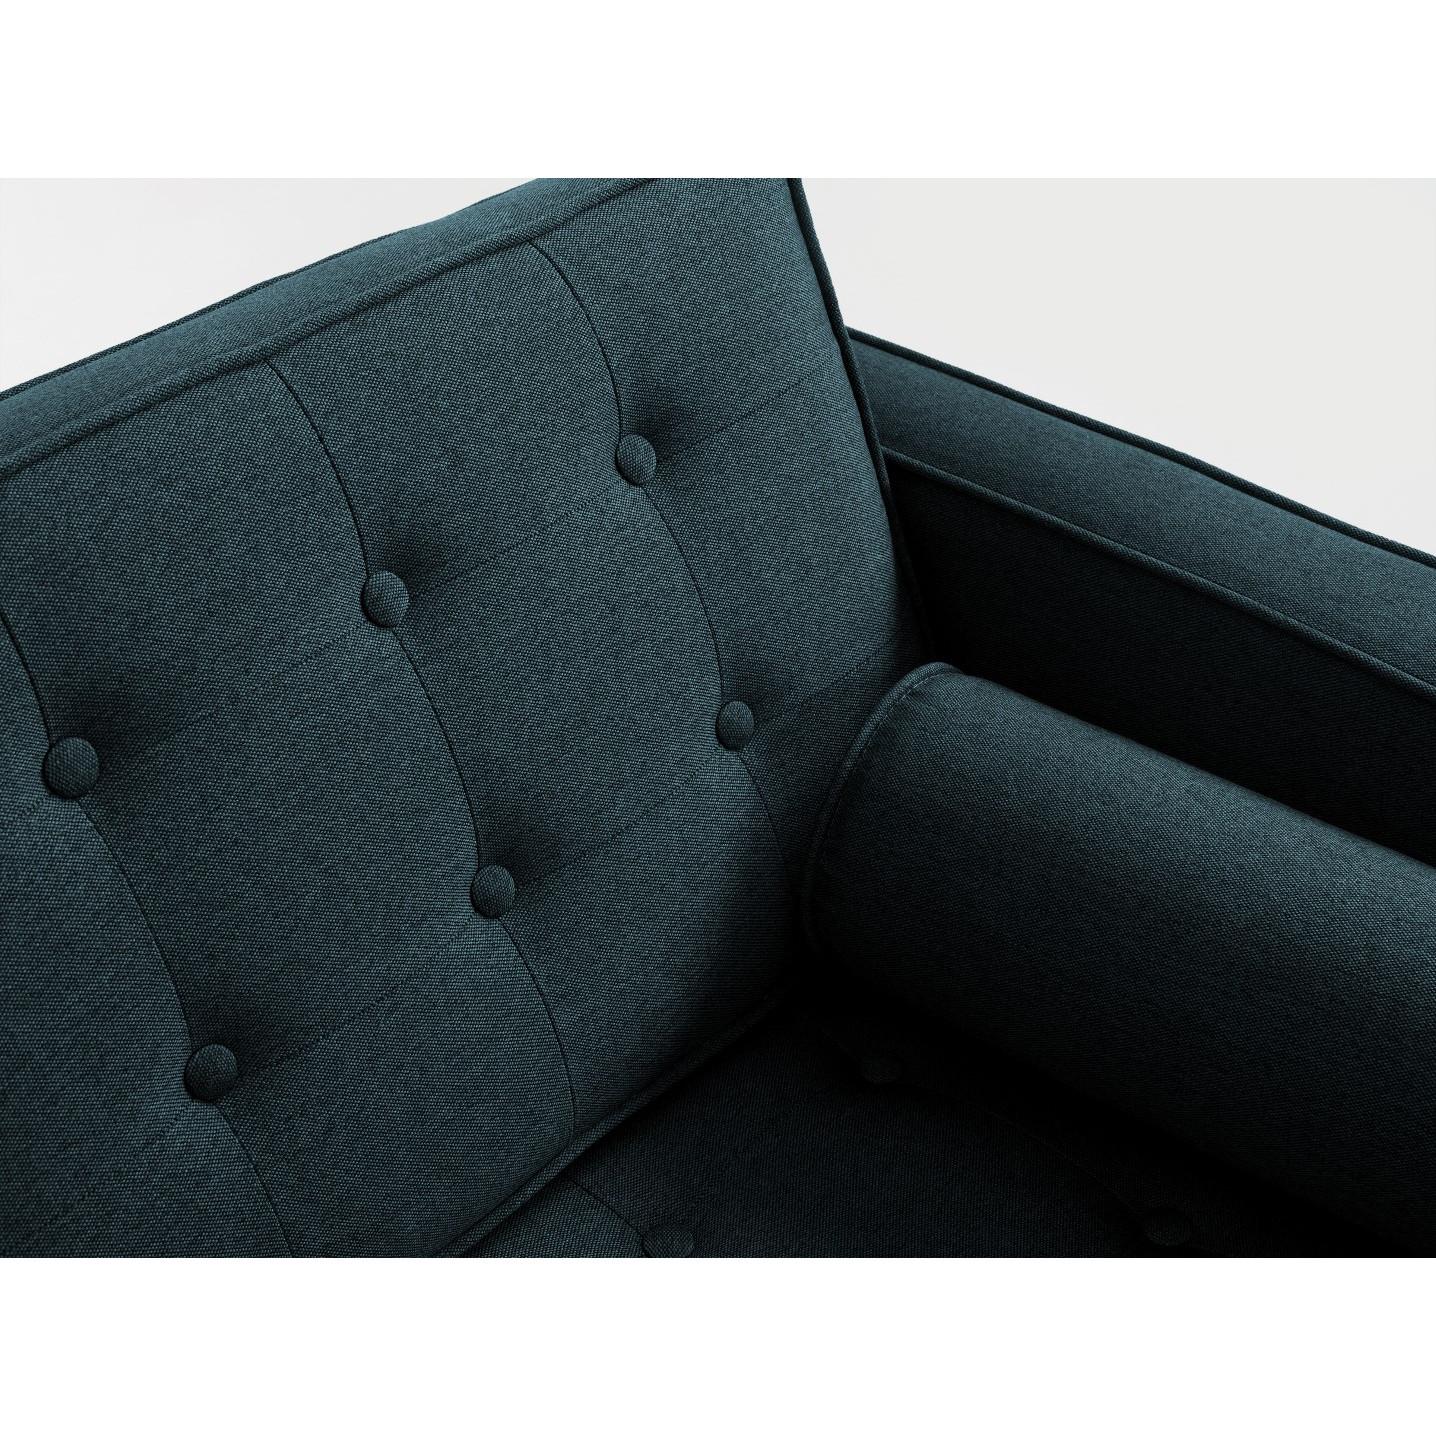 3 Seater Sofa Topic Wood   Deep Sea